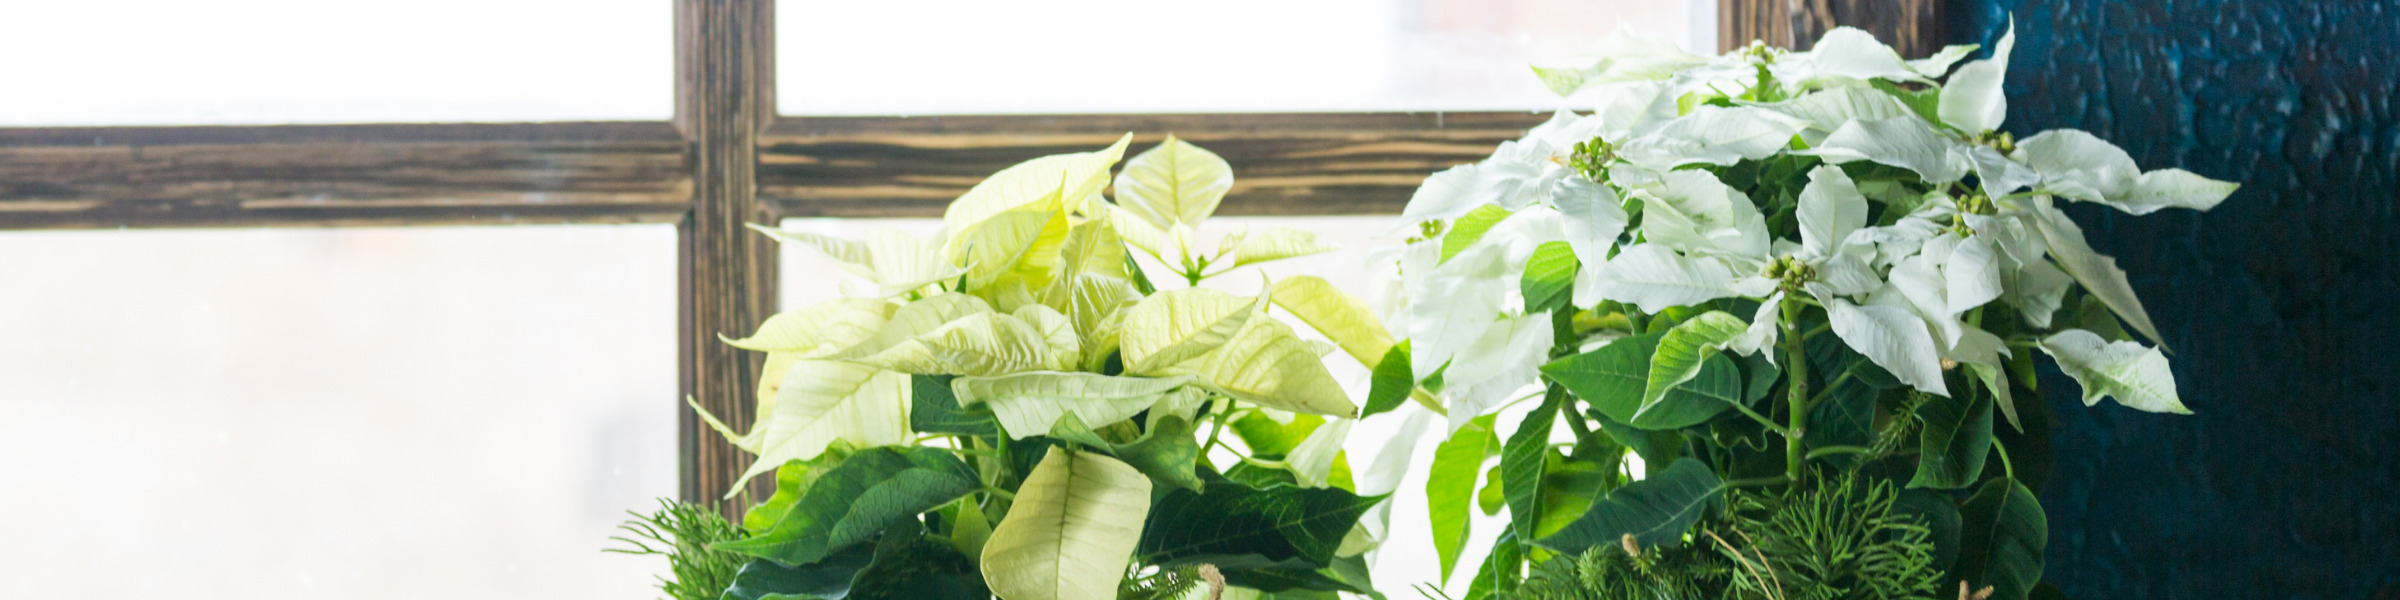 FAQ Header Image Poinsettia Sales